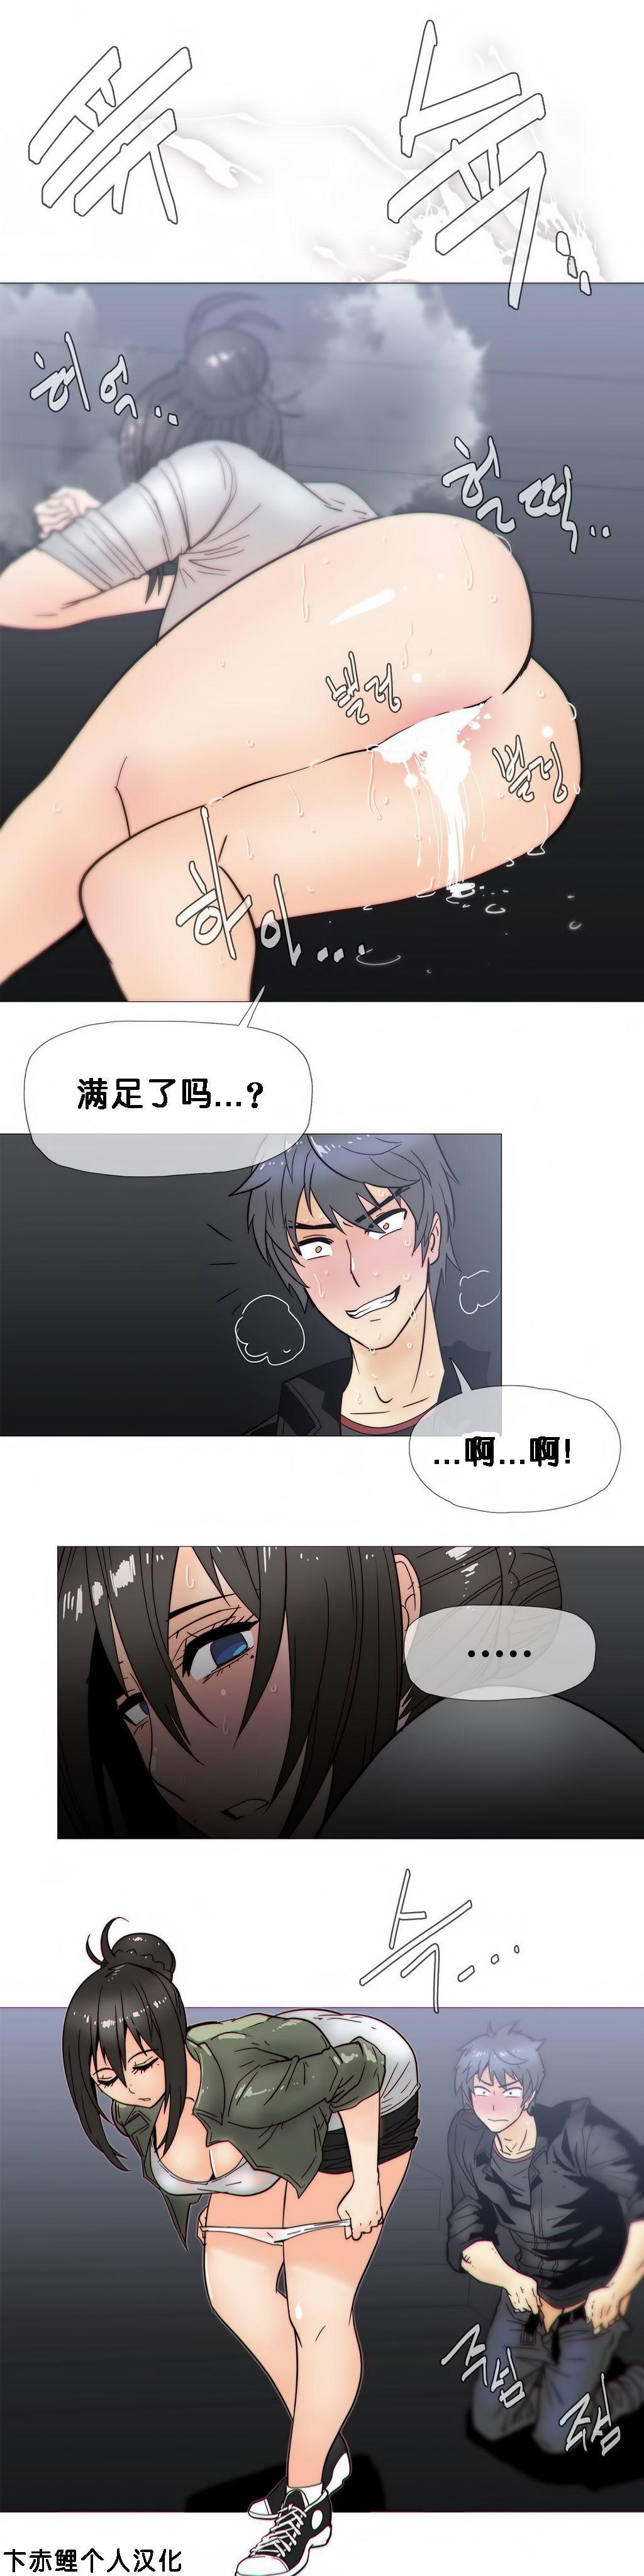 HouseHold Affairs 【卞赤鲤个人汉化】1~33话(持续更新中) 488